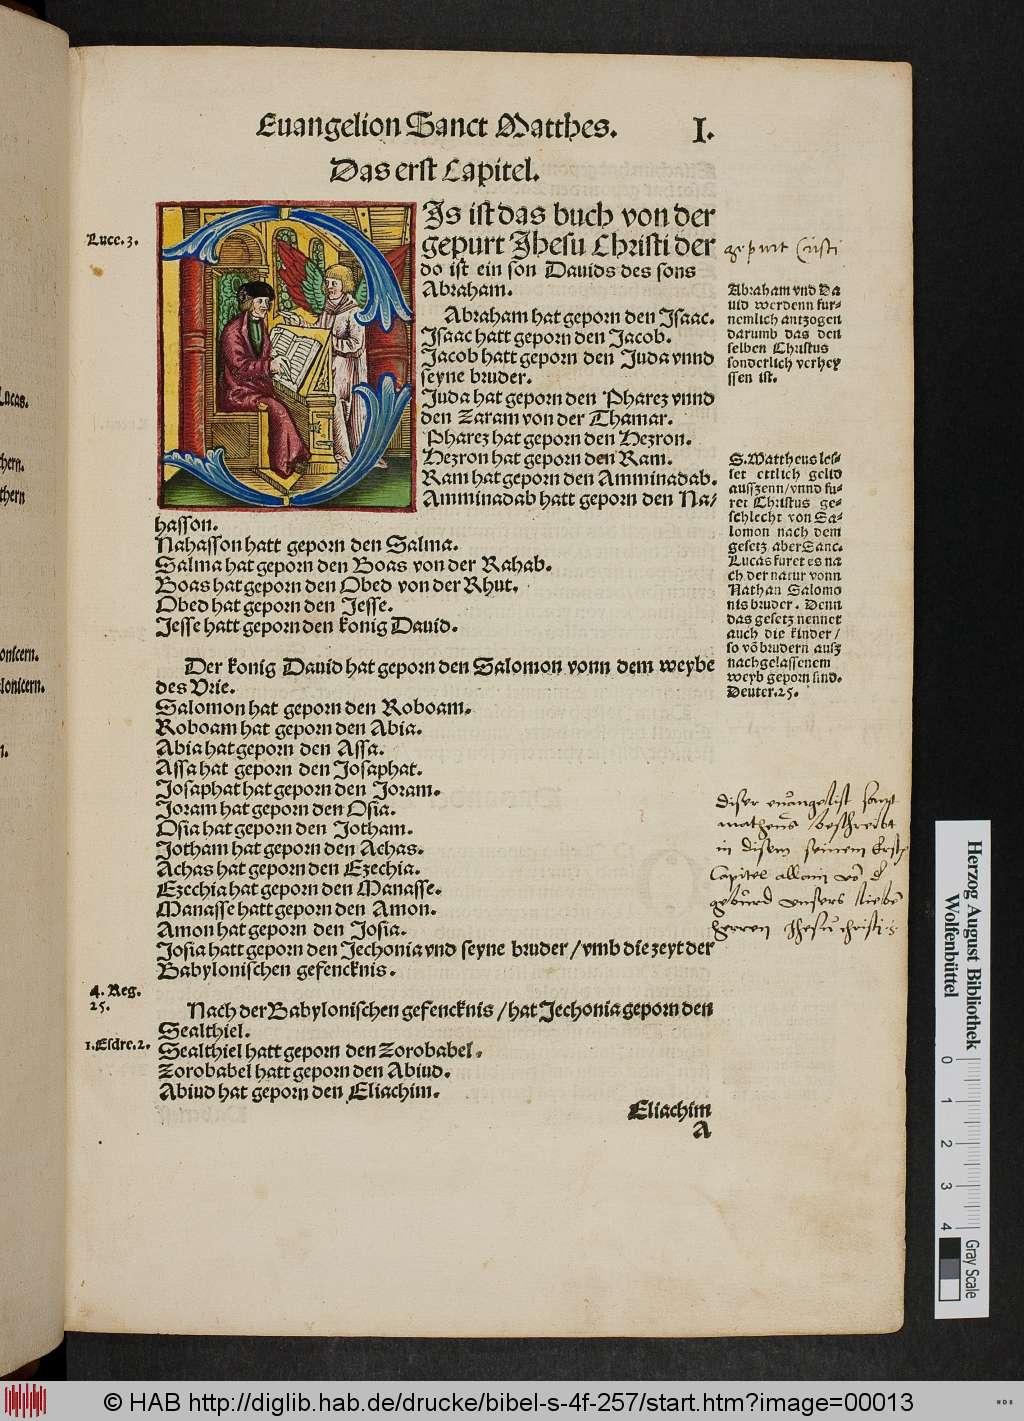 http://diglib.hab.de/drucke/bibel-s-4f-257/00013.jpg